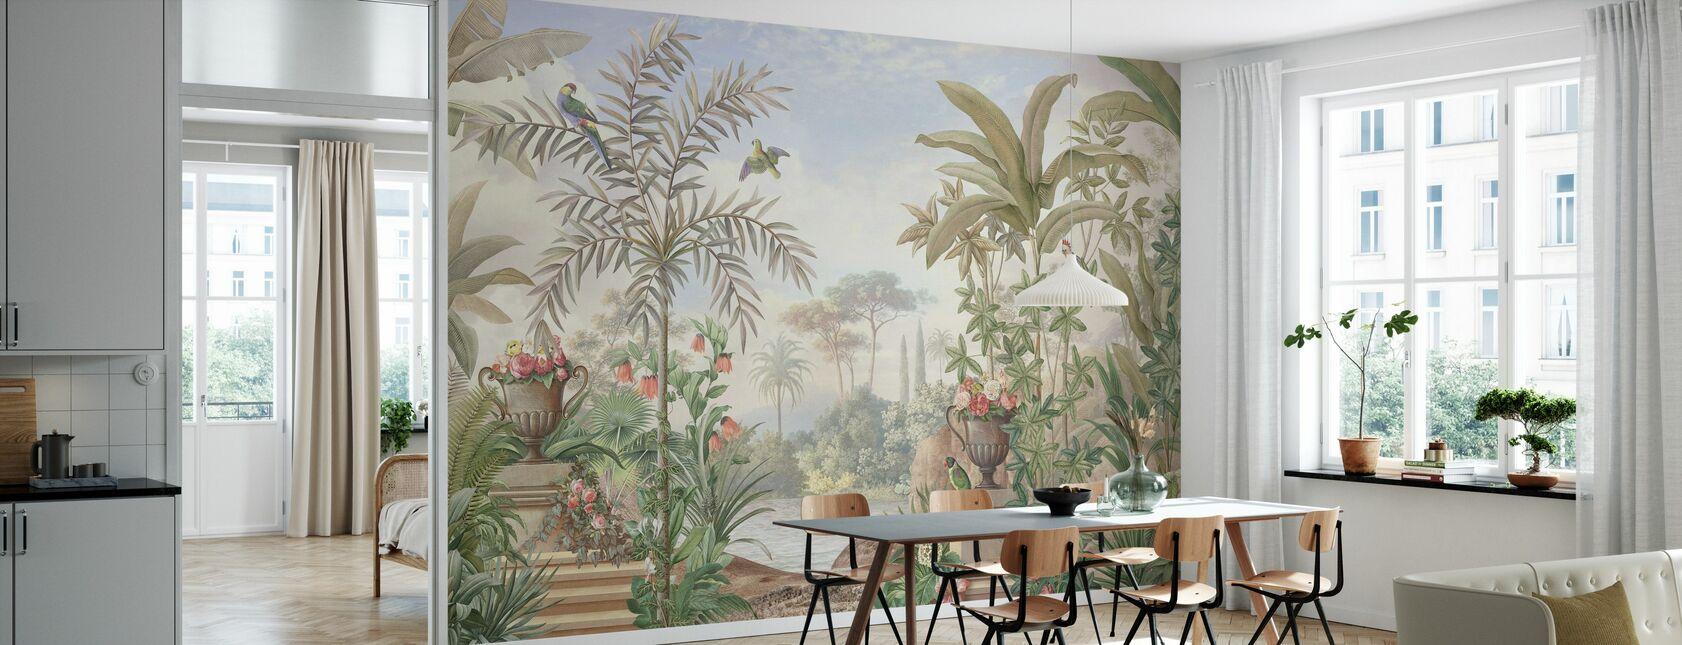 Tropical Patio - Wallpaper - Kitchen